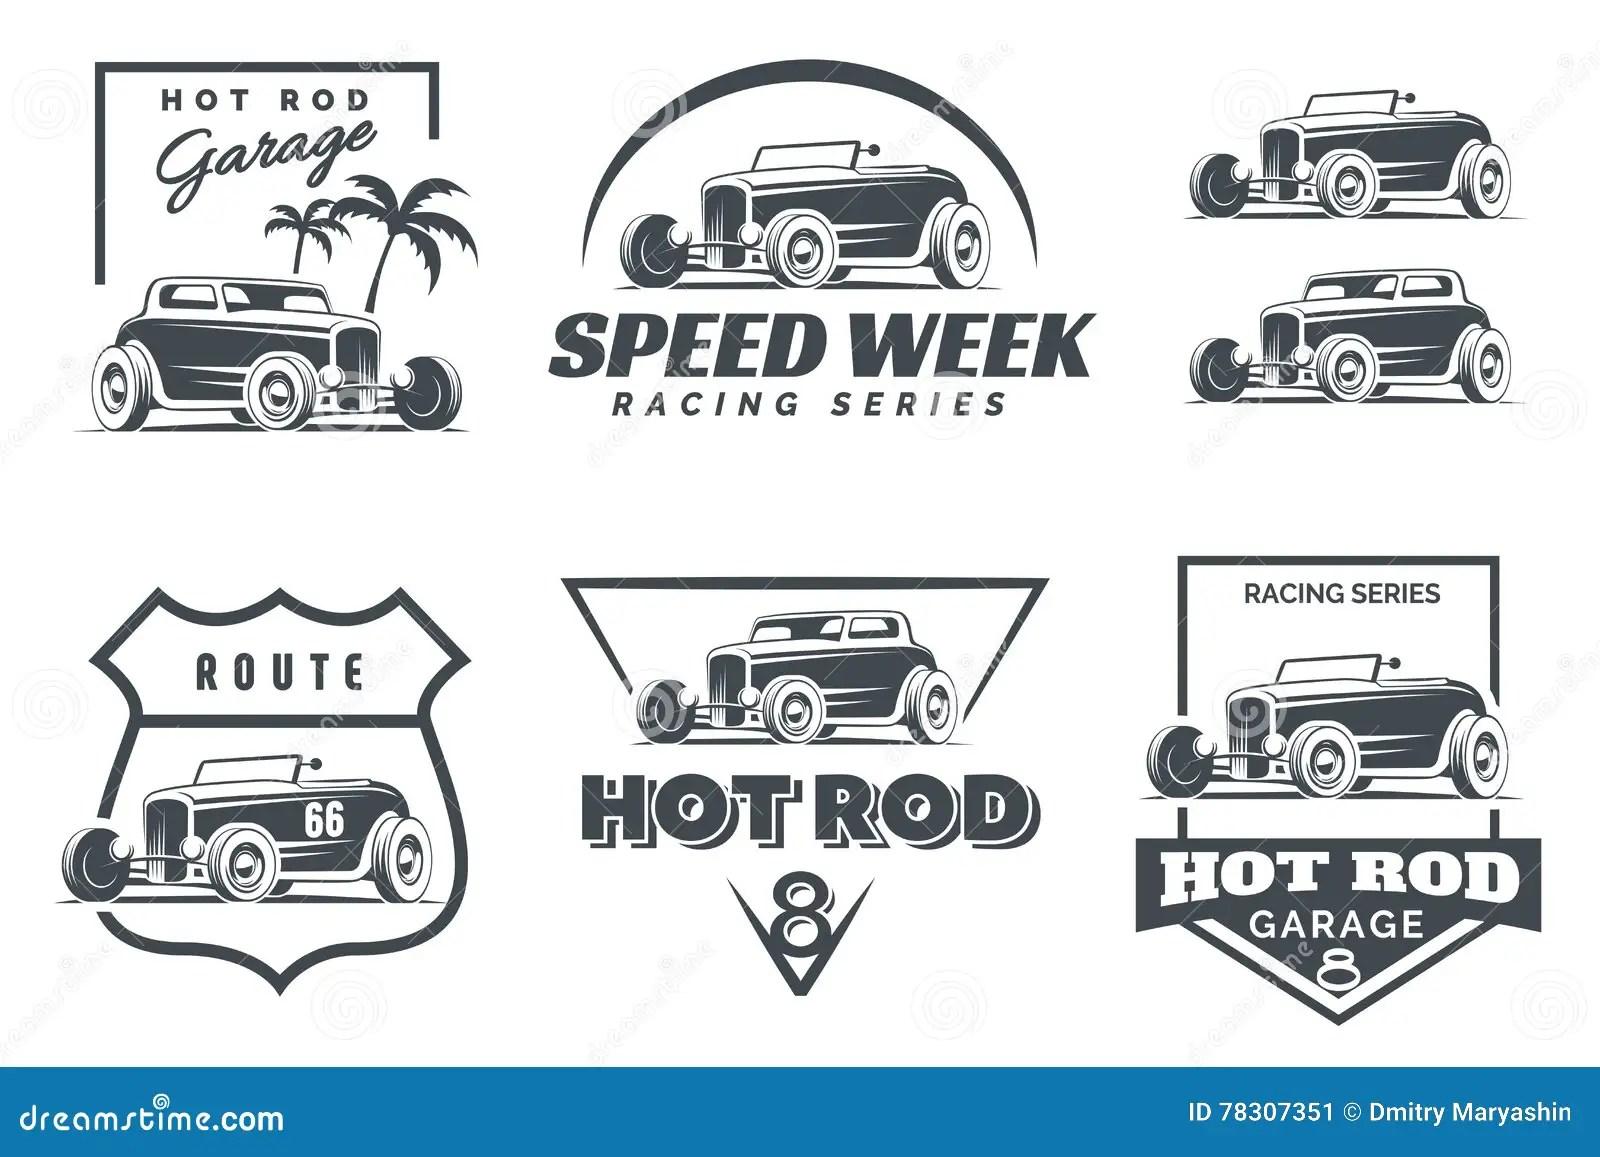 Hotrod Fire Engine Cartoons Illustrations Amp Vector Stock